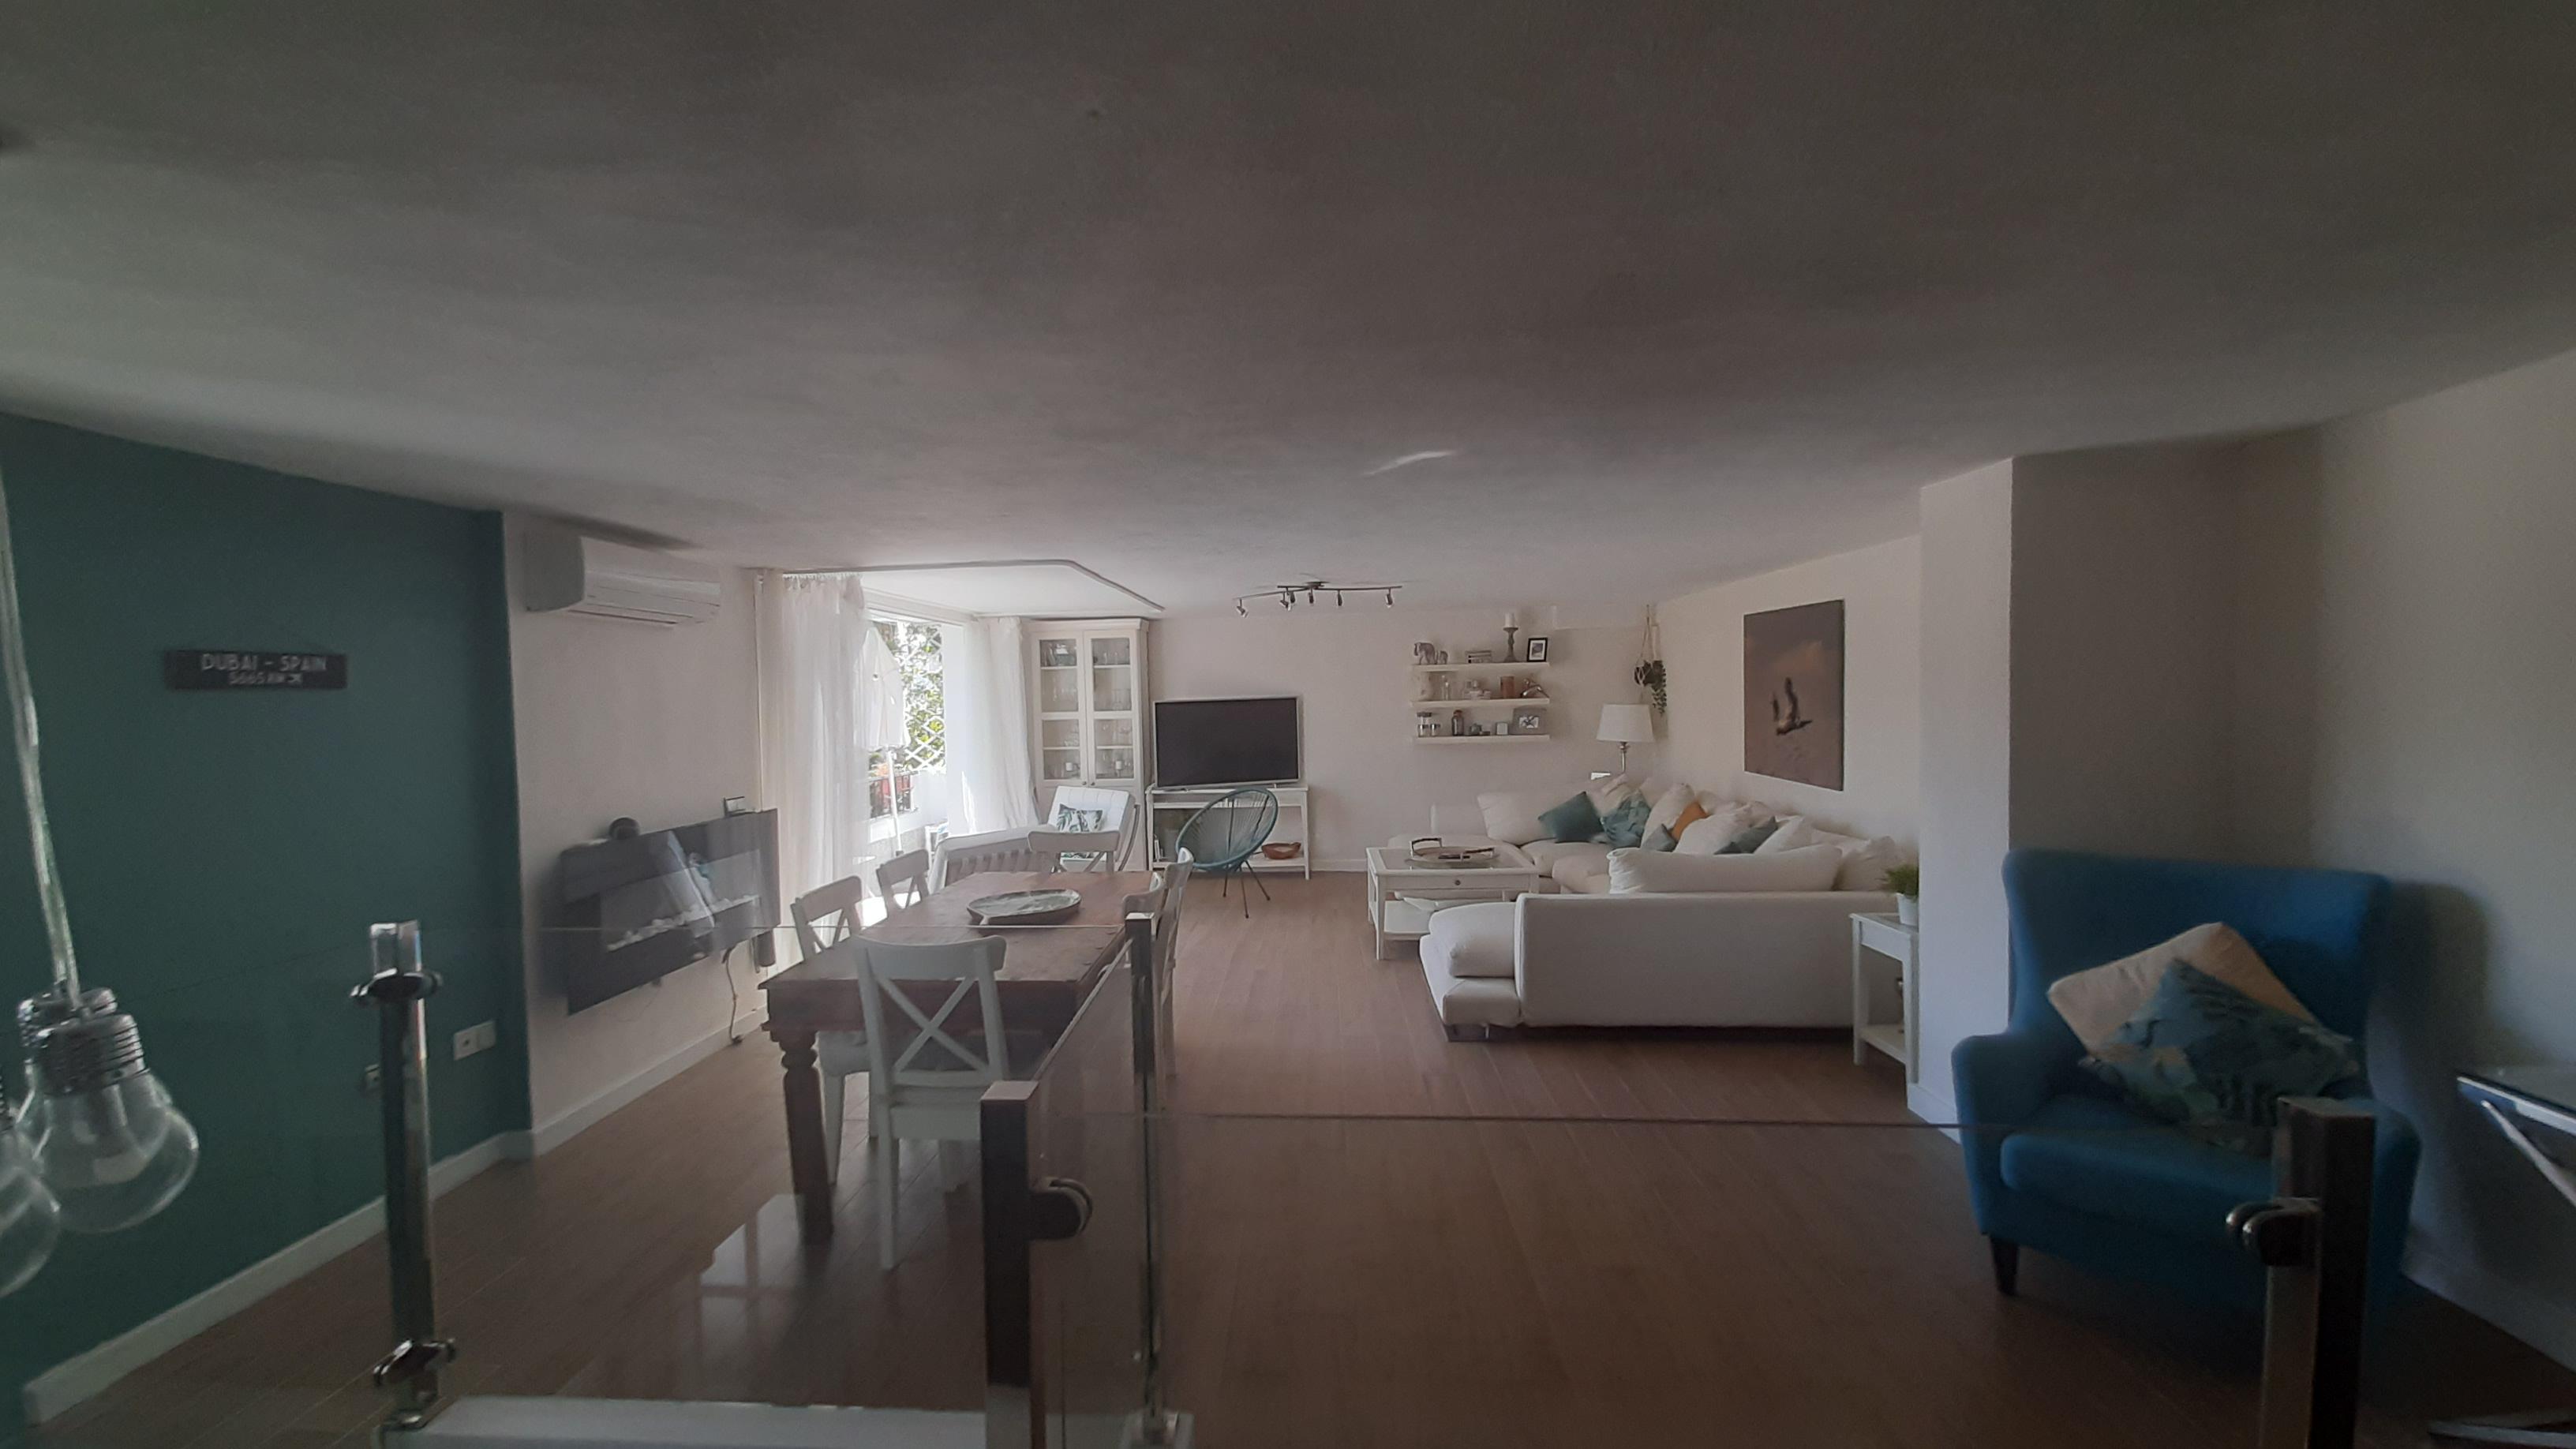 3 bedroom apartment for sale, Benahavis village